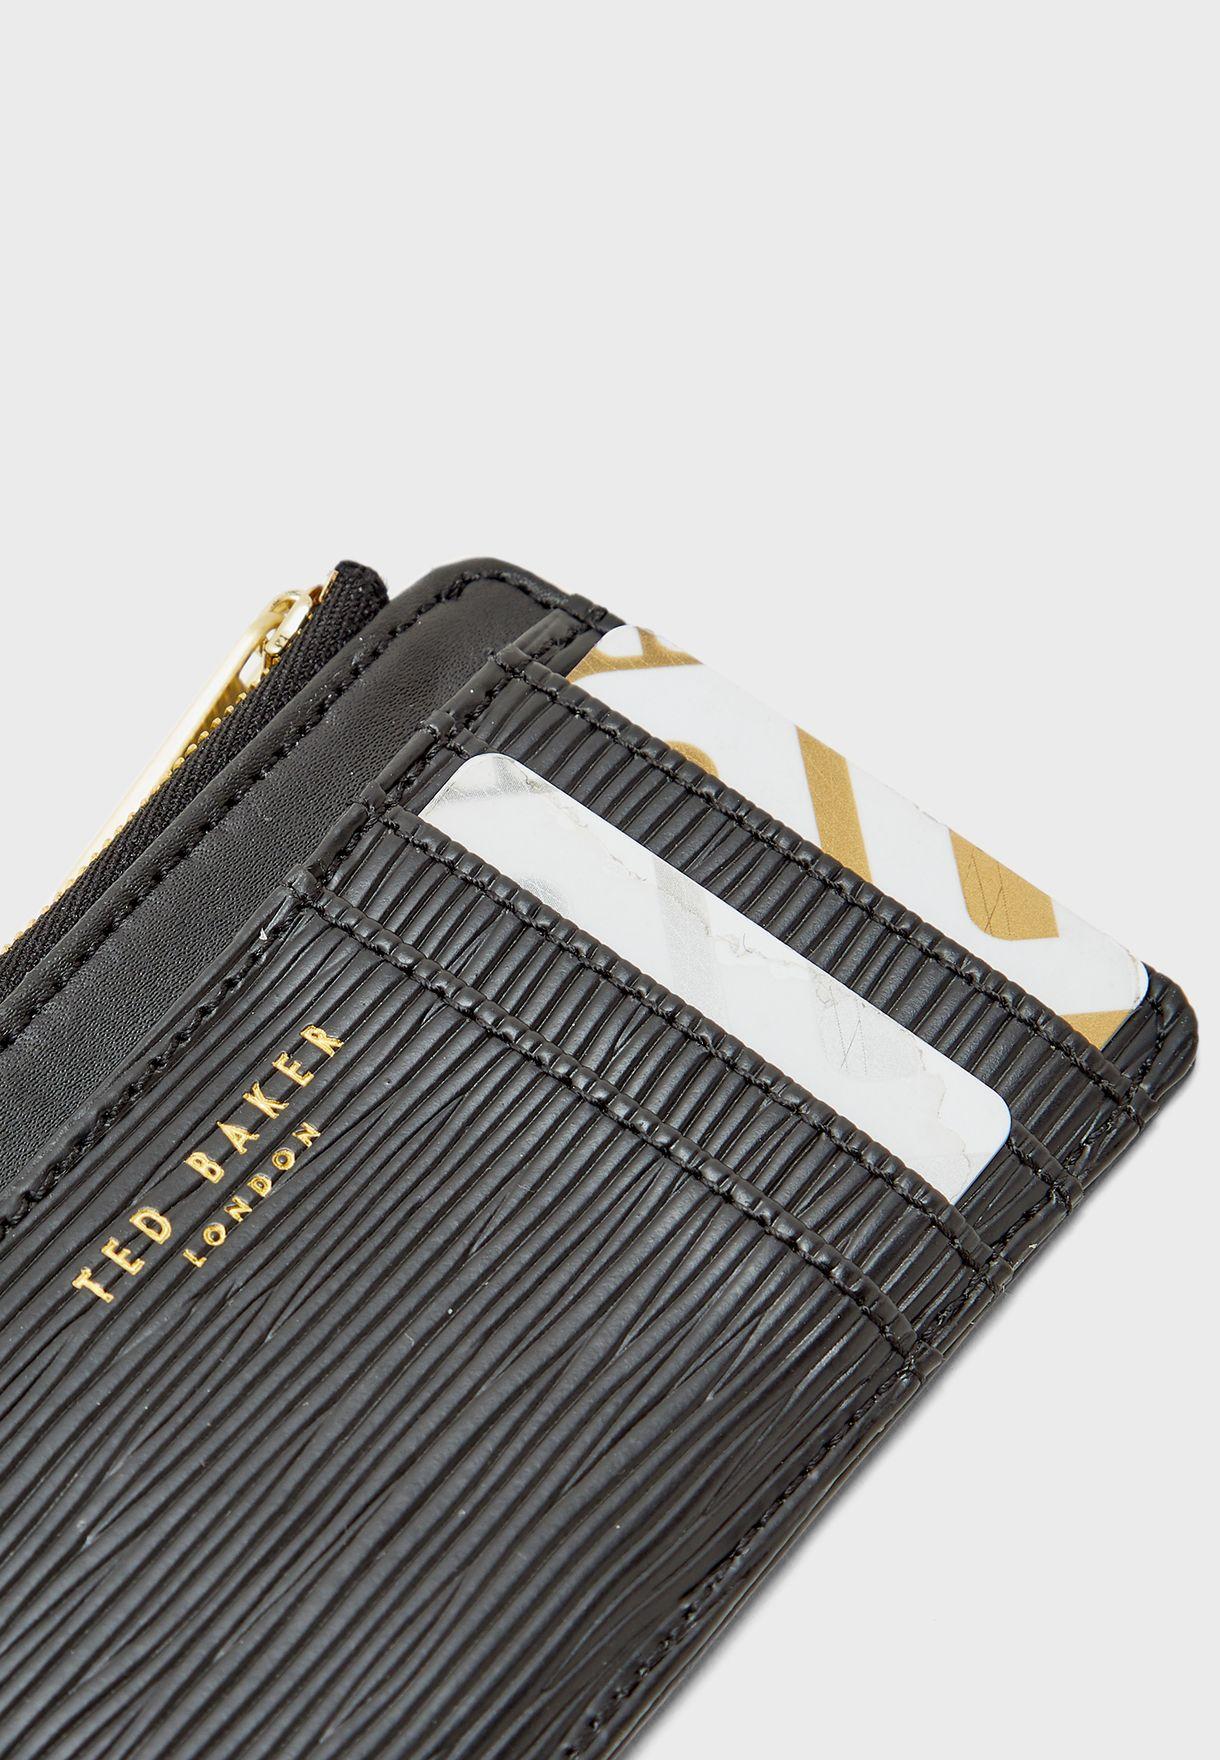 Blueb Bow Detail Card Holder